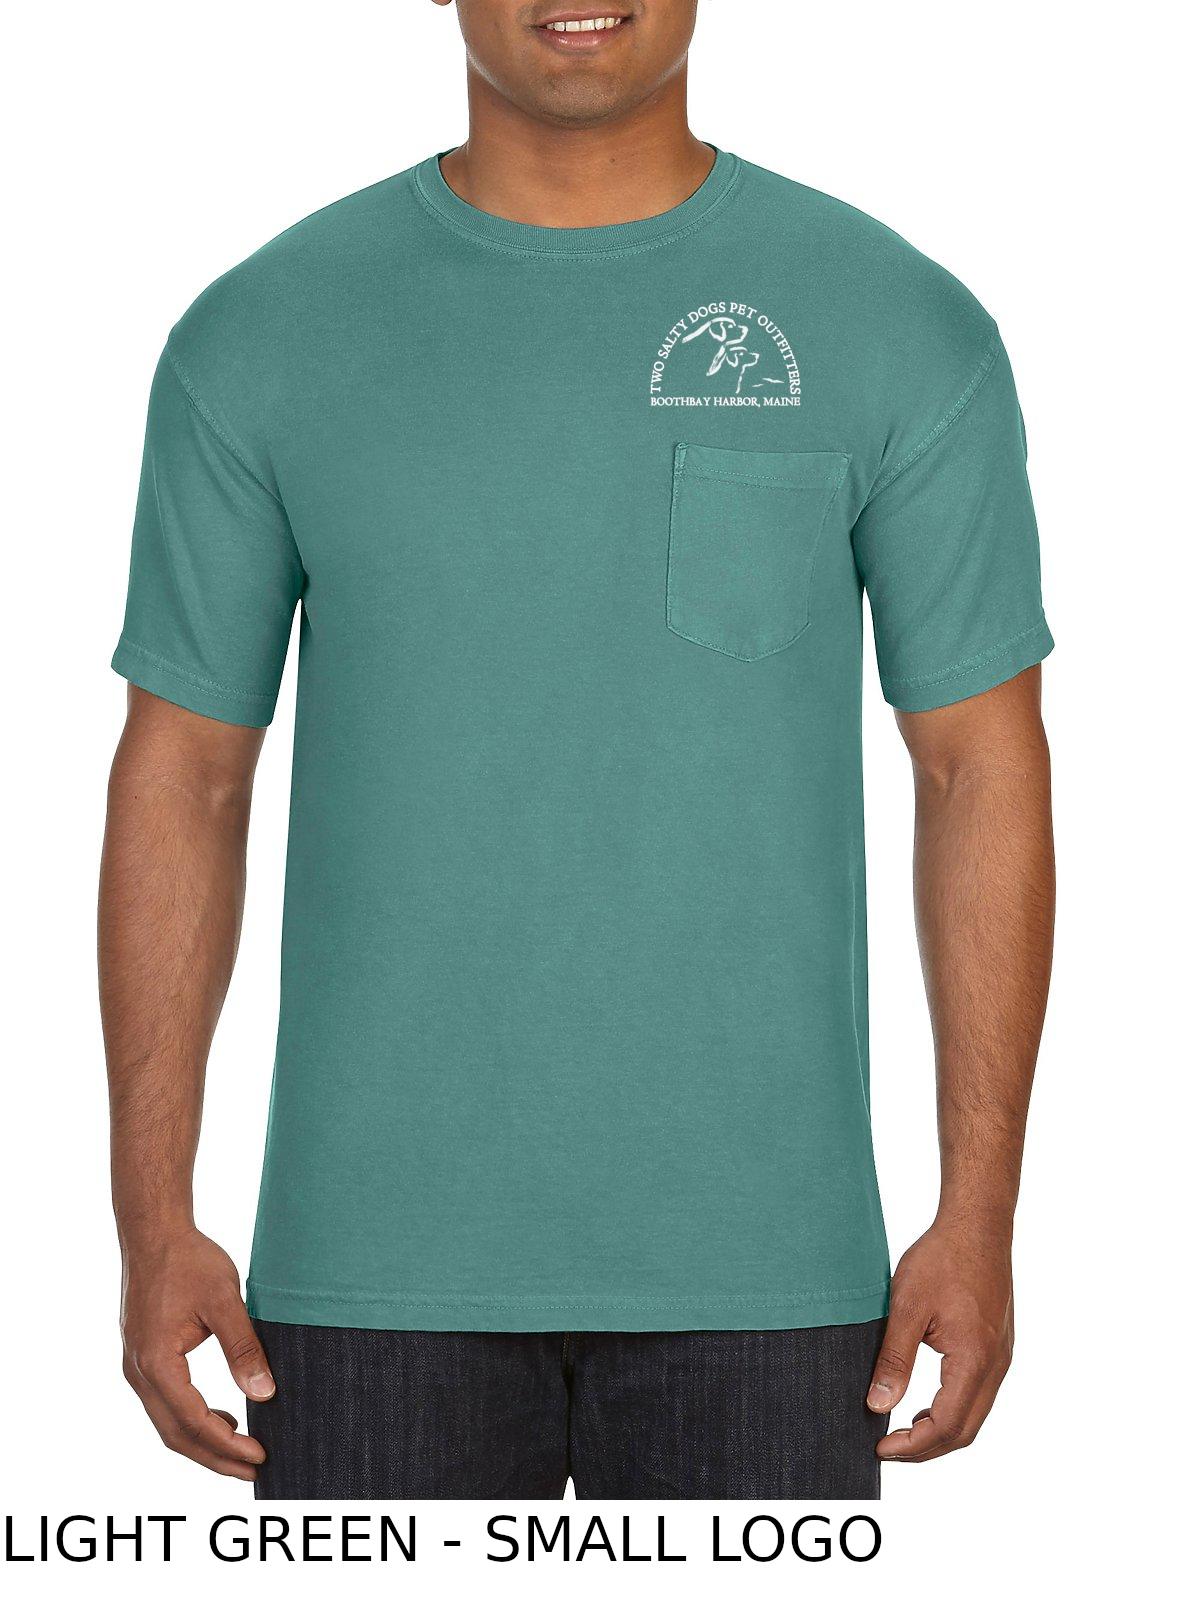 bbha-ss-t-shirt-pocket-light-green-front-small-logo